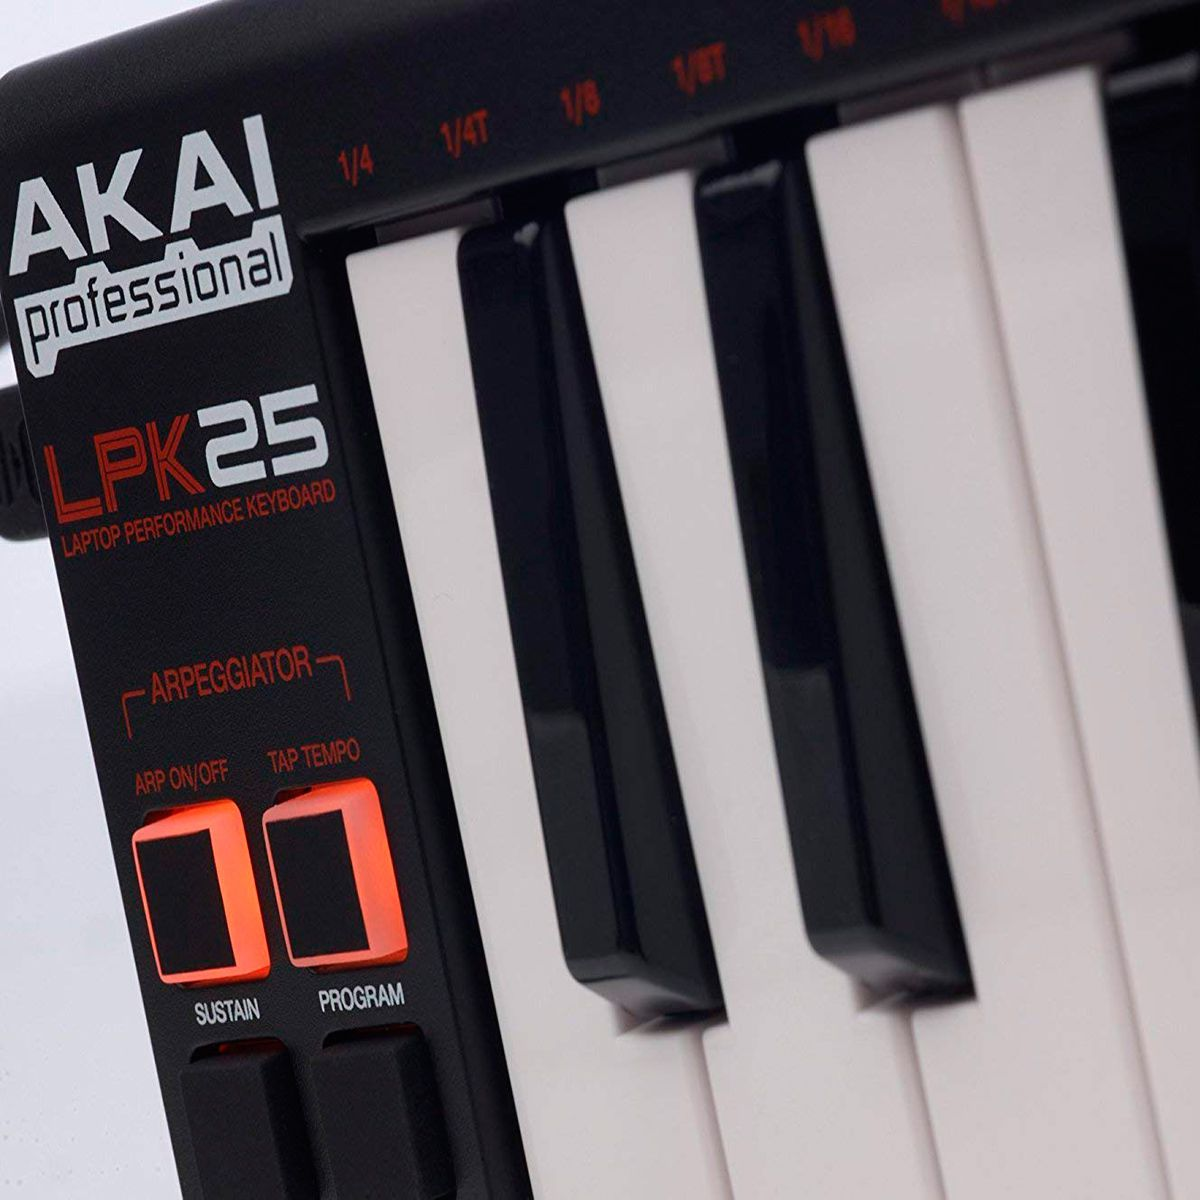 Teclado Controlador Akai Professional LPK25 V2 Mini 25 Teclas